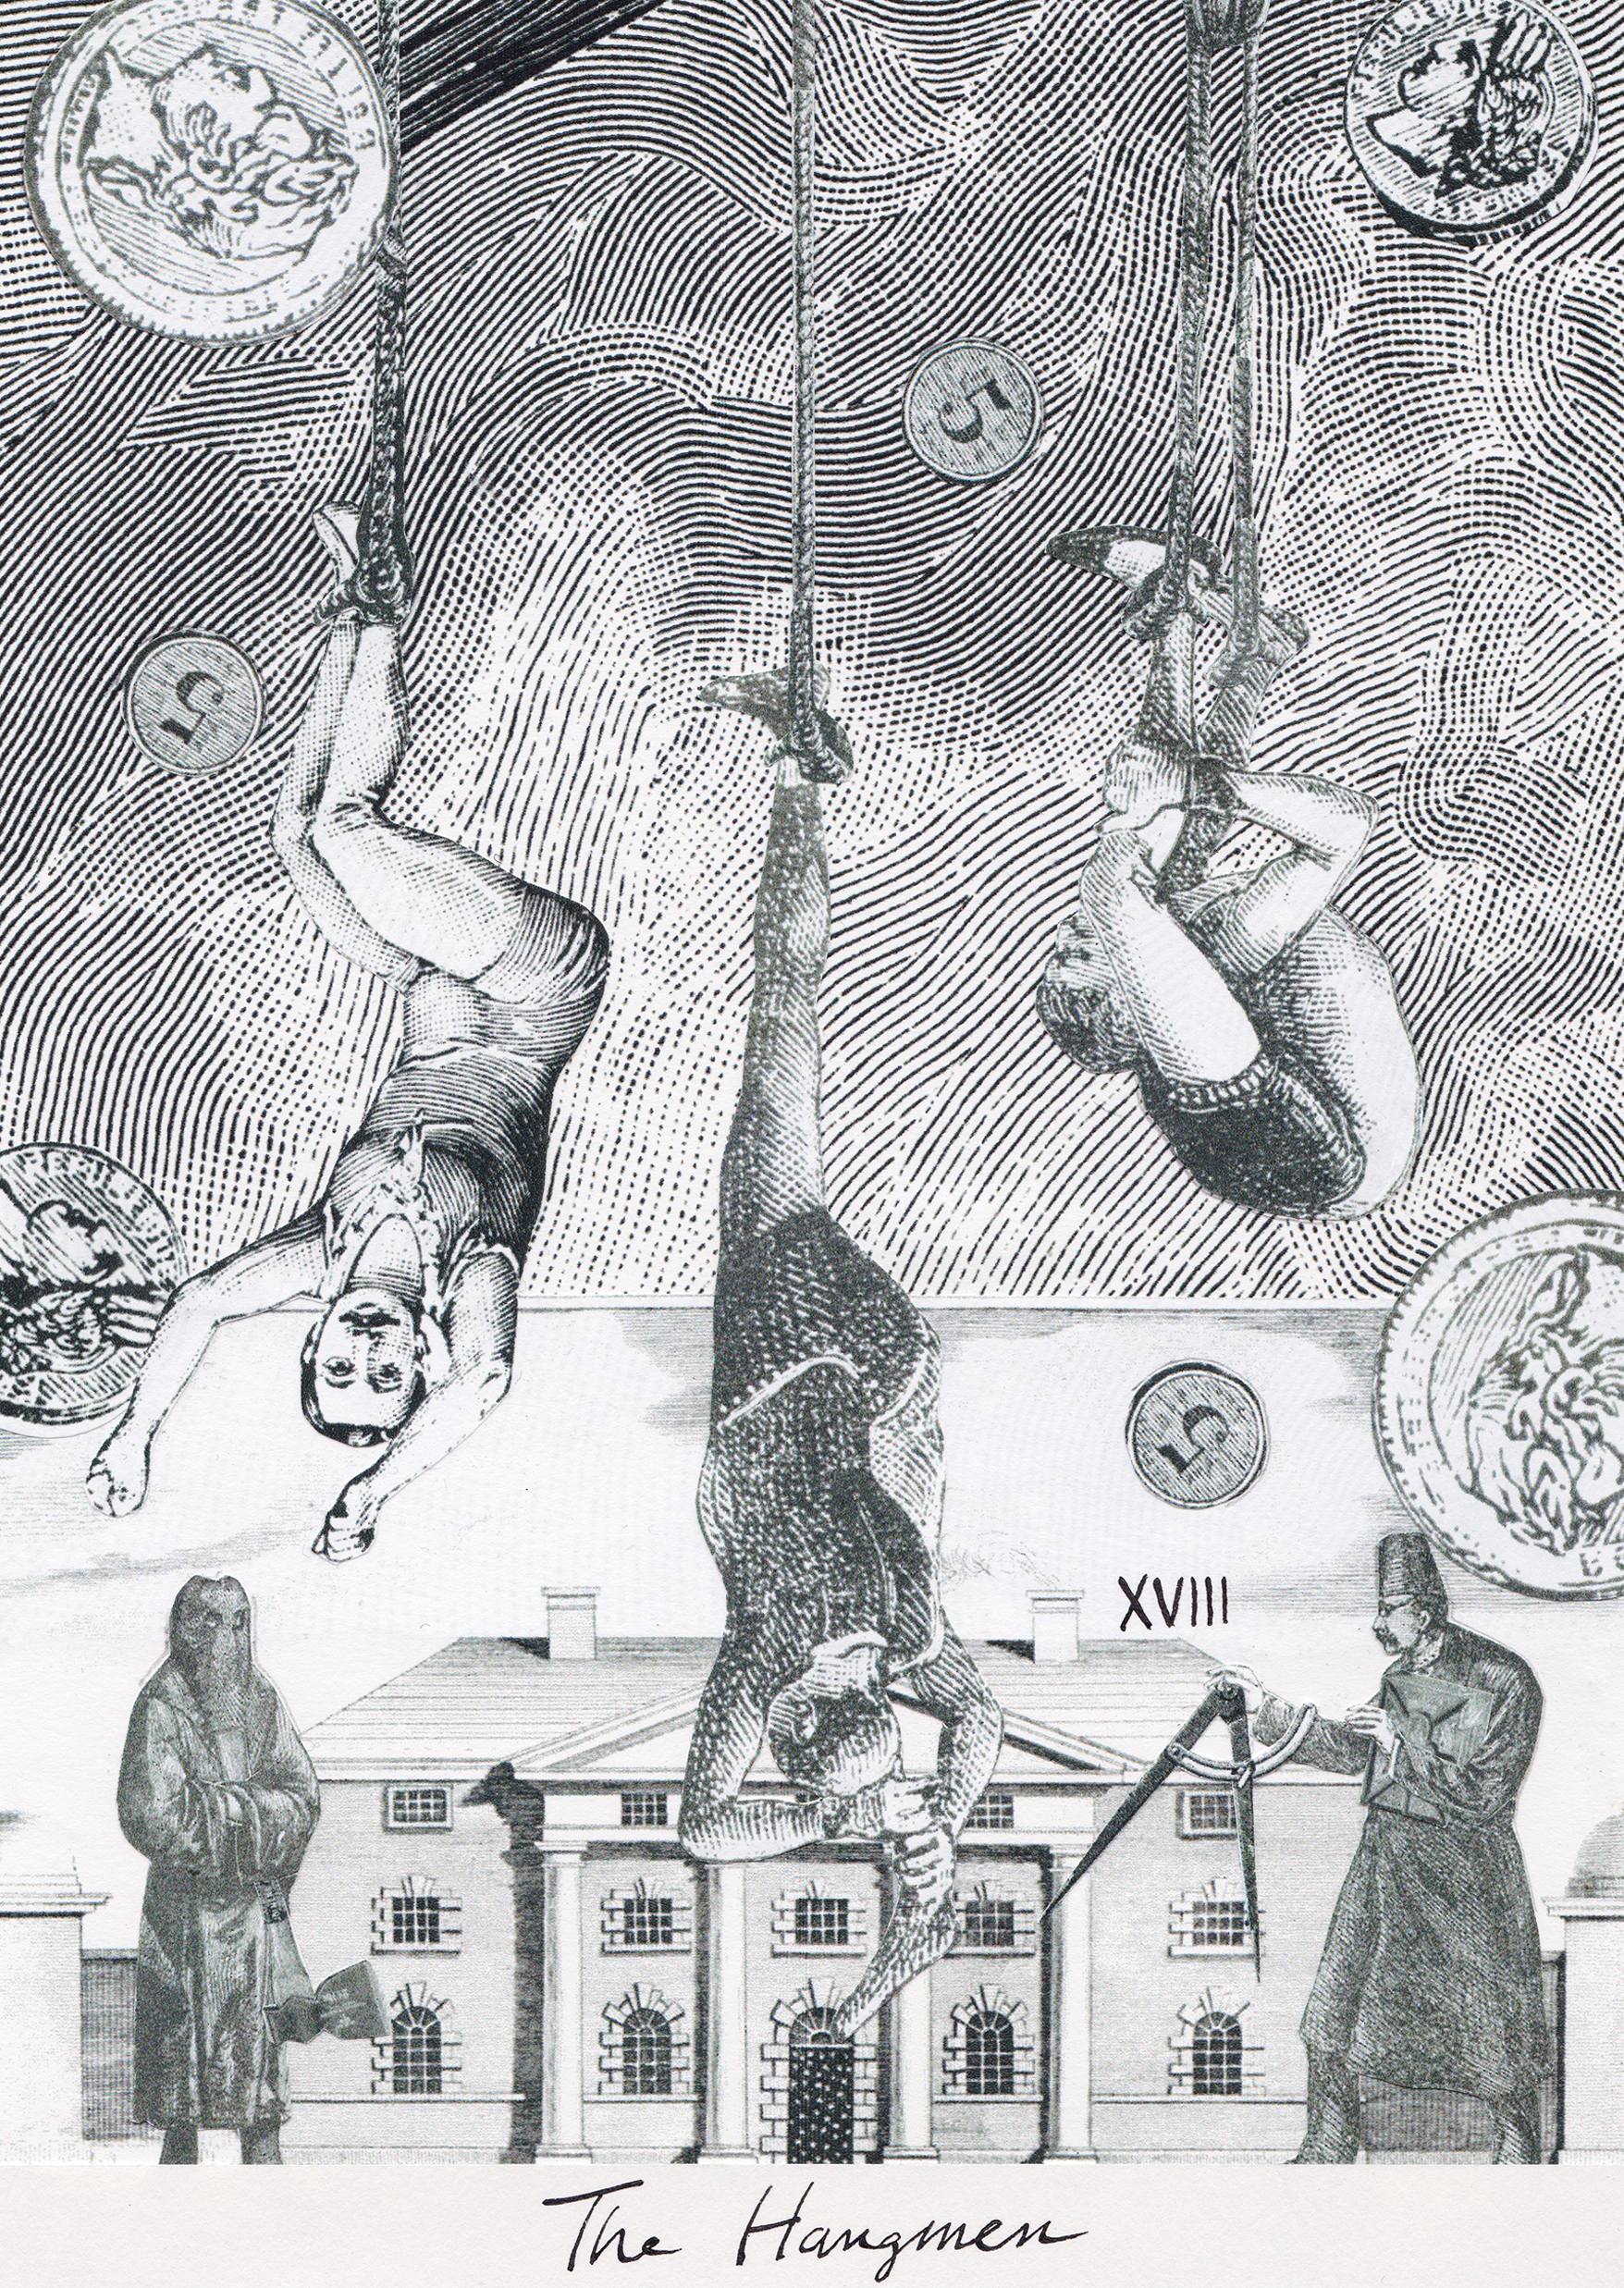 The Hangmen, Collage Giclée print on Hahnemühle Photo Rag, 21x14.8cm